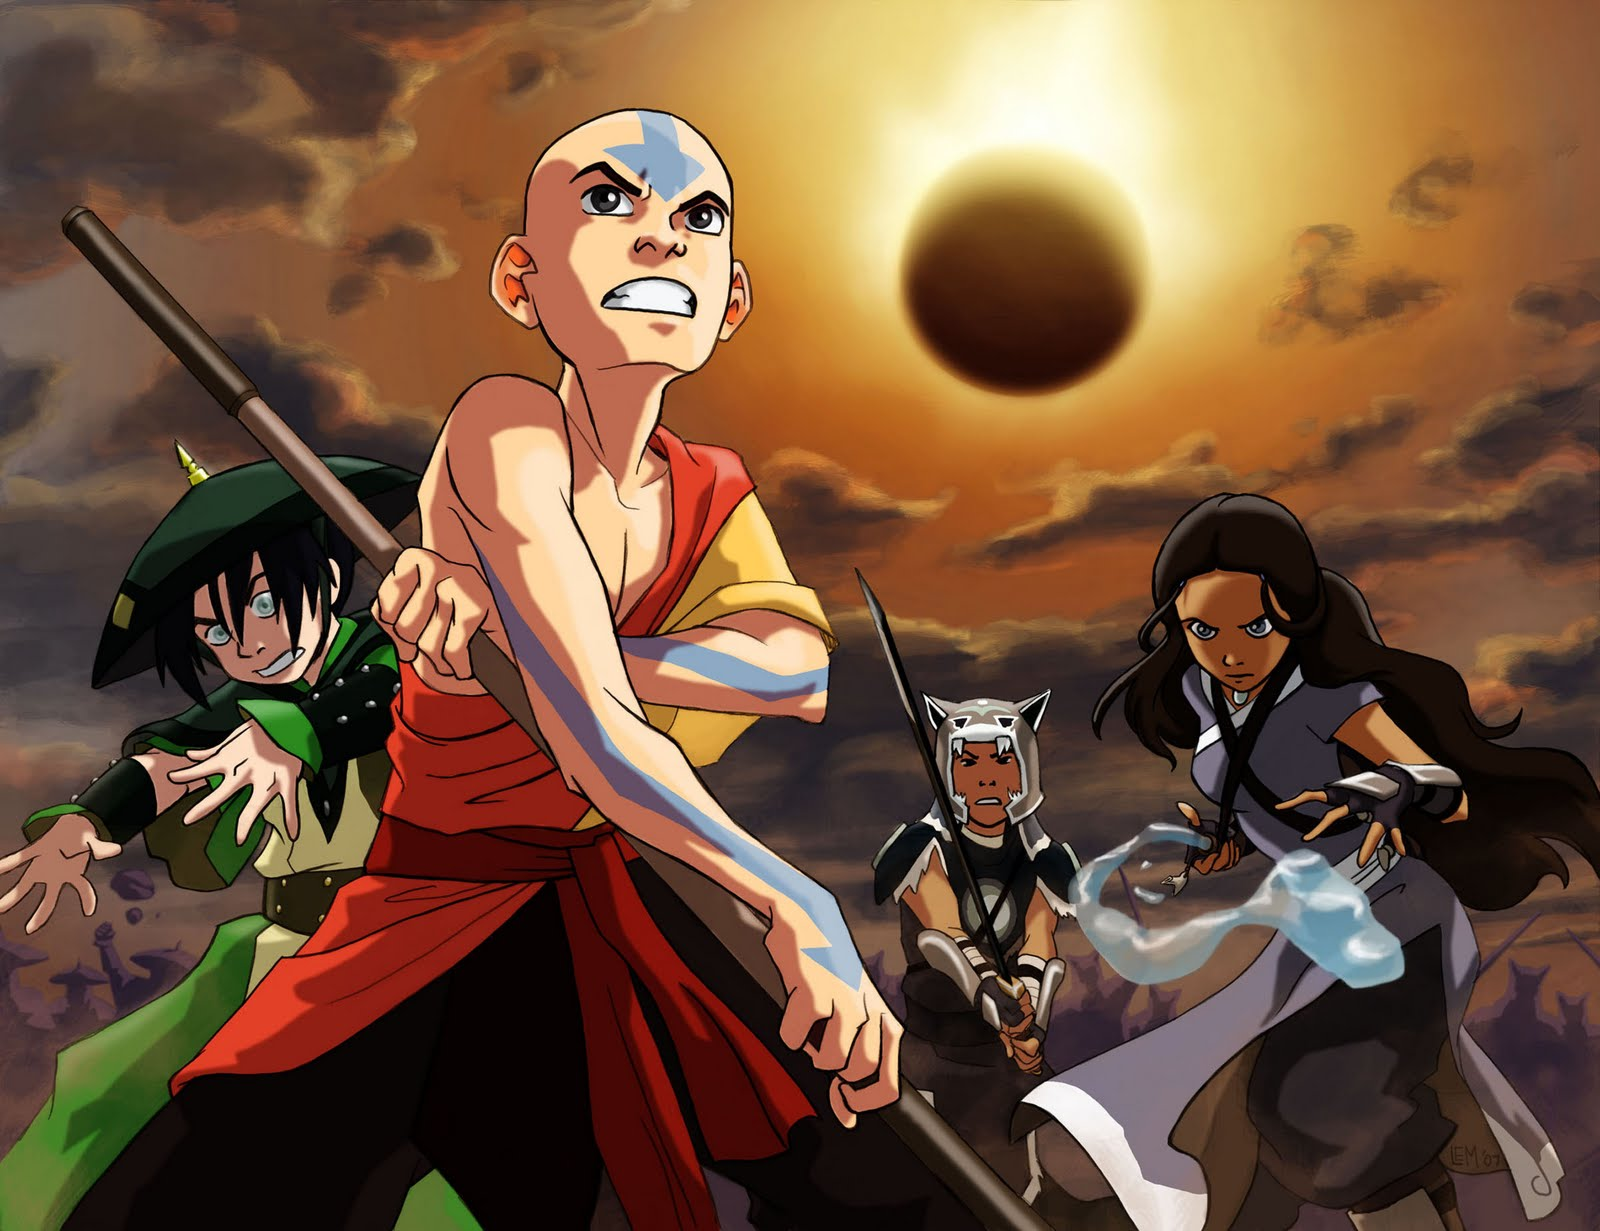 Avatar the last airbender season 4